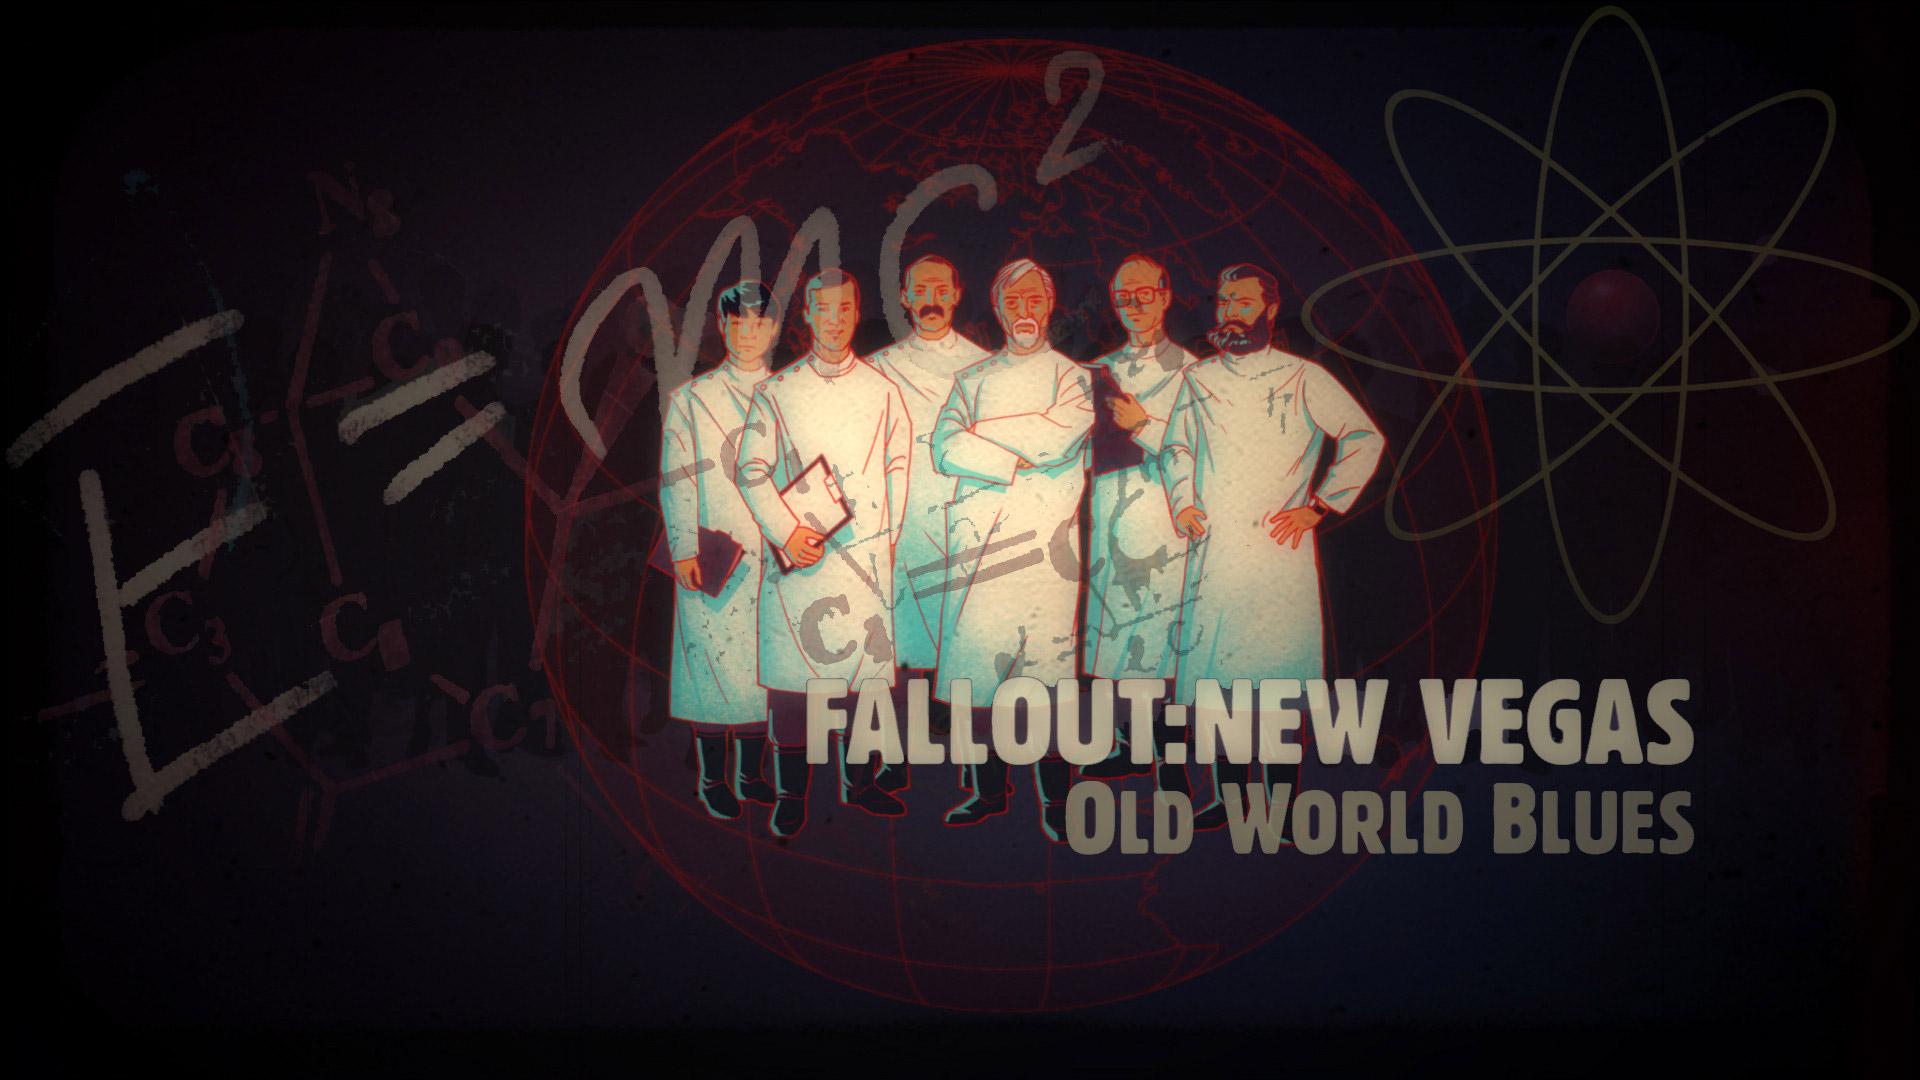 Free Fallout: New Vegas Wallpaper in 1920x1080